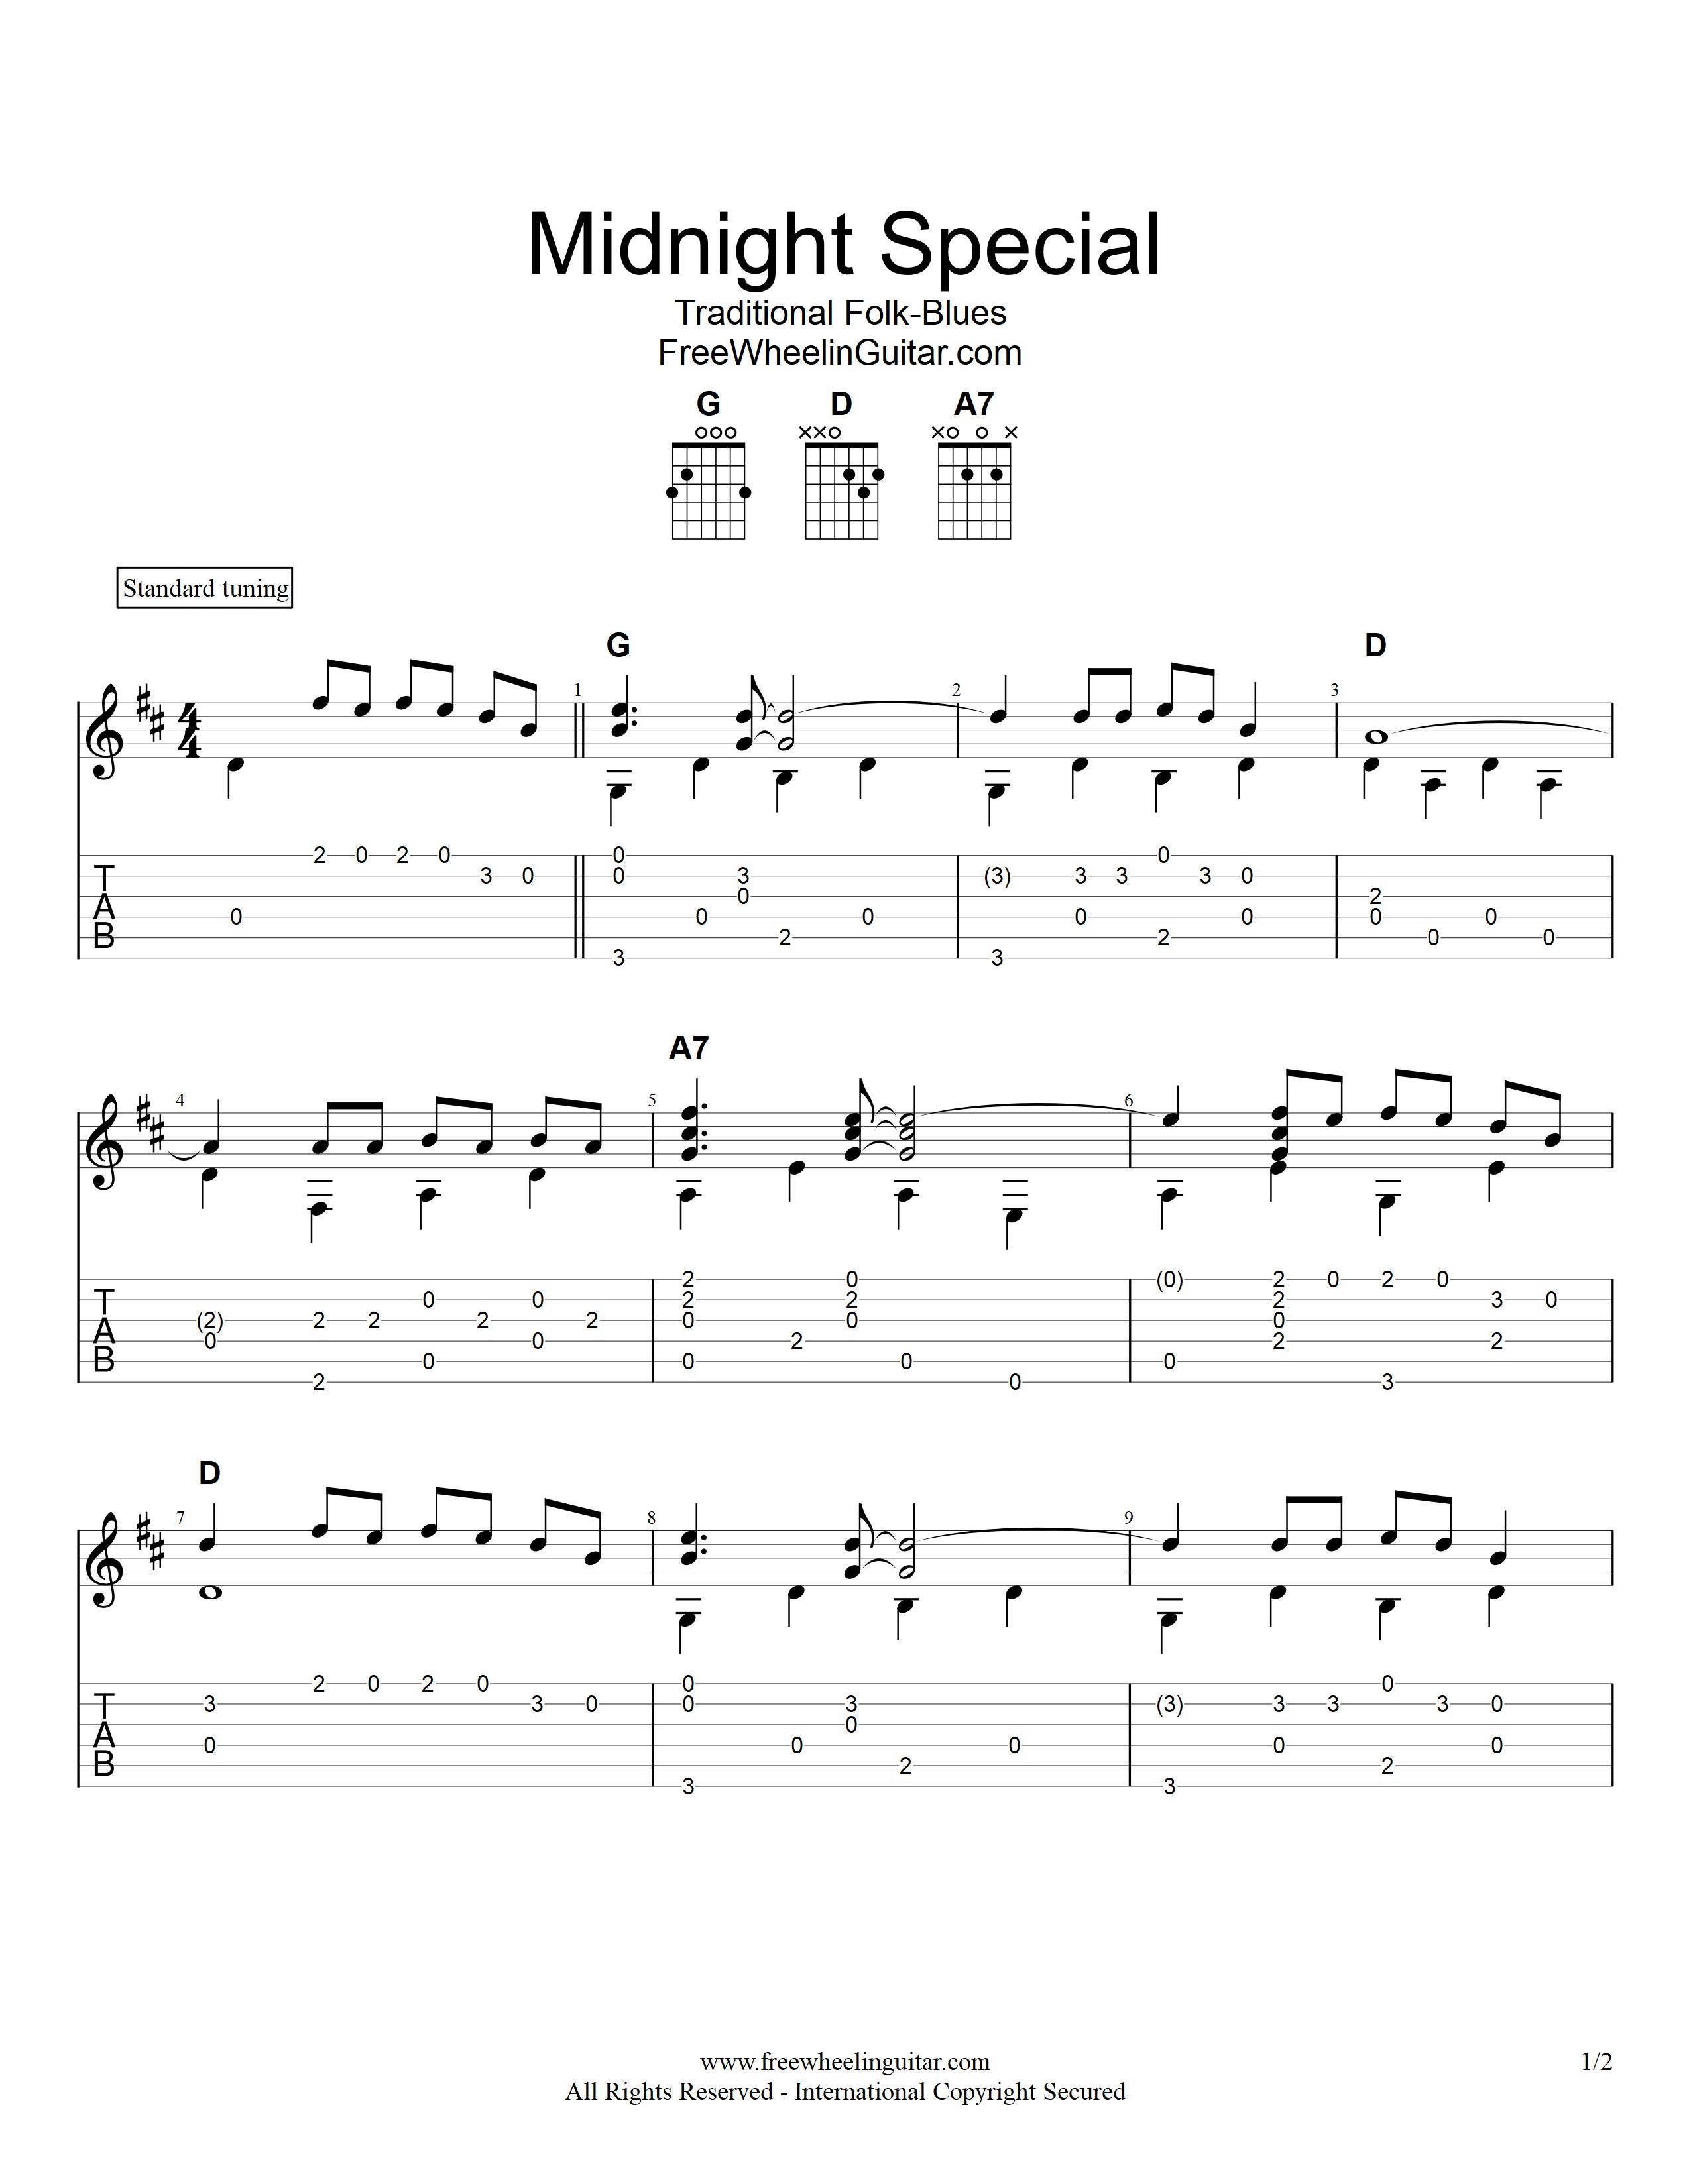 Midnight Special   Fingerstyle Guitar Tab   FreeWheelinGuitar.com ...